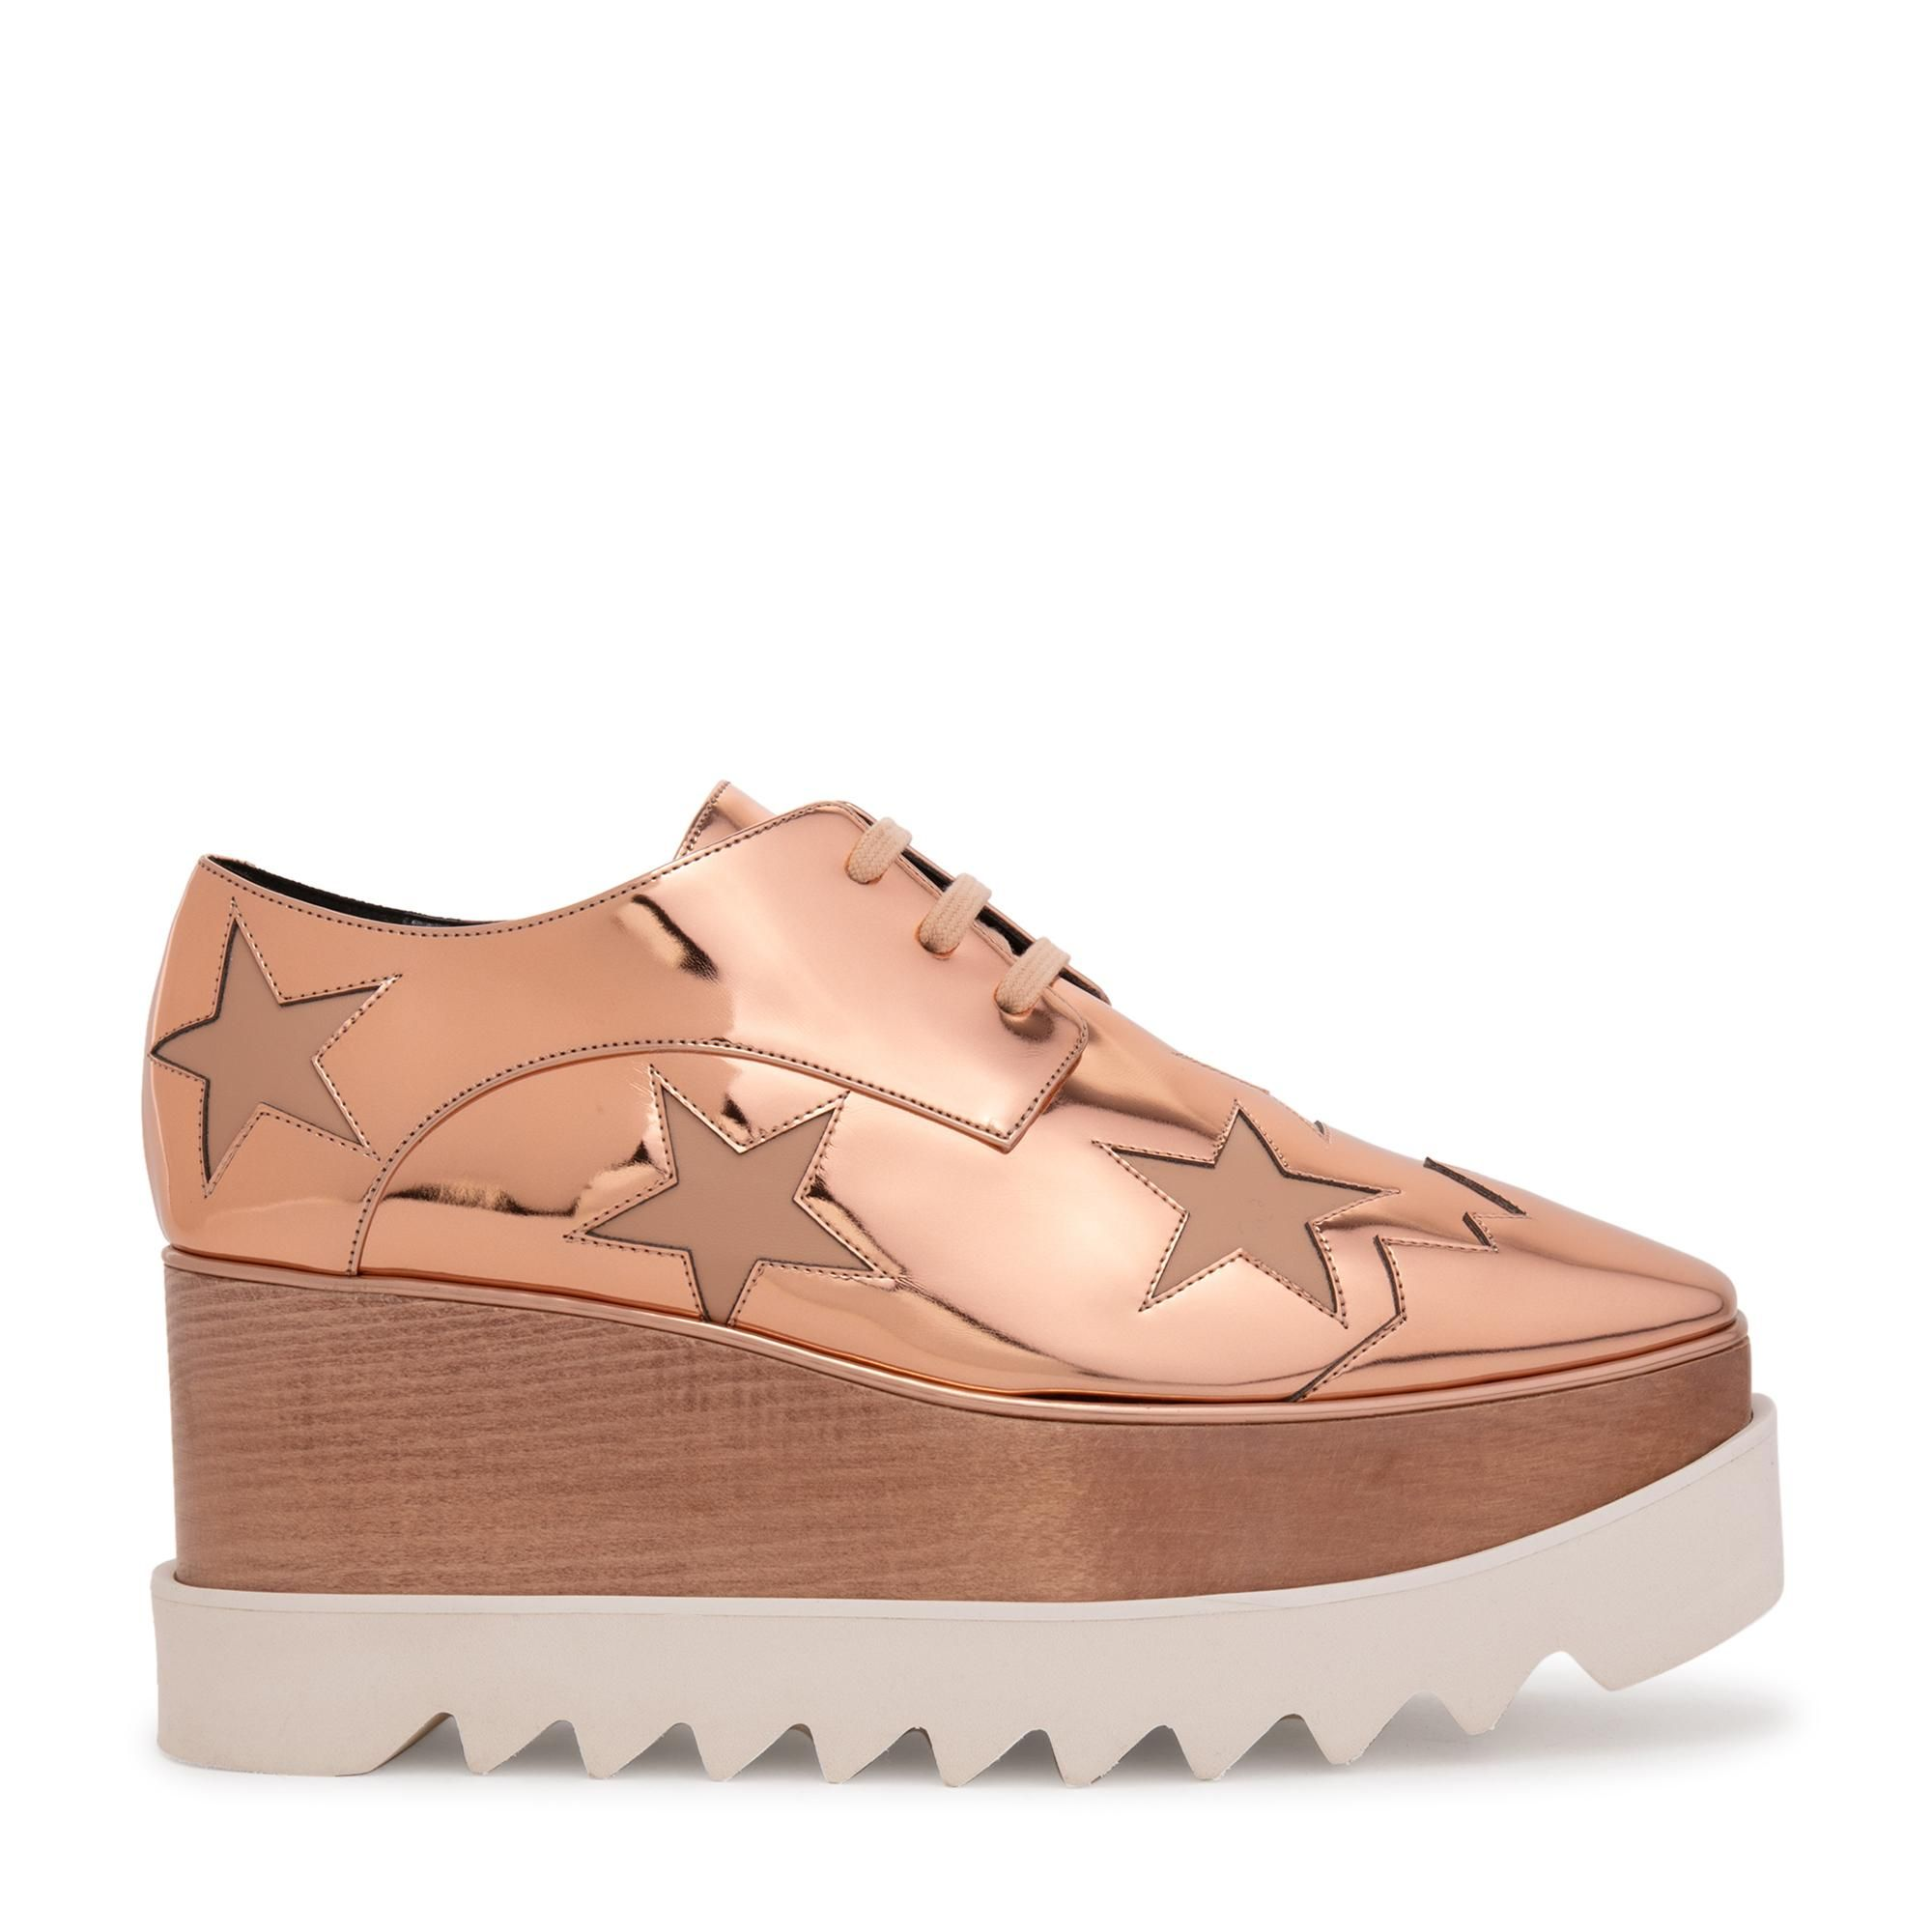 Elyse star shoes